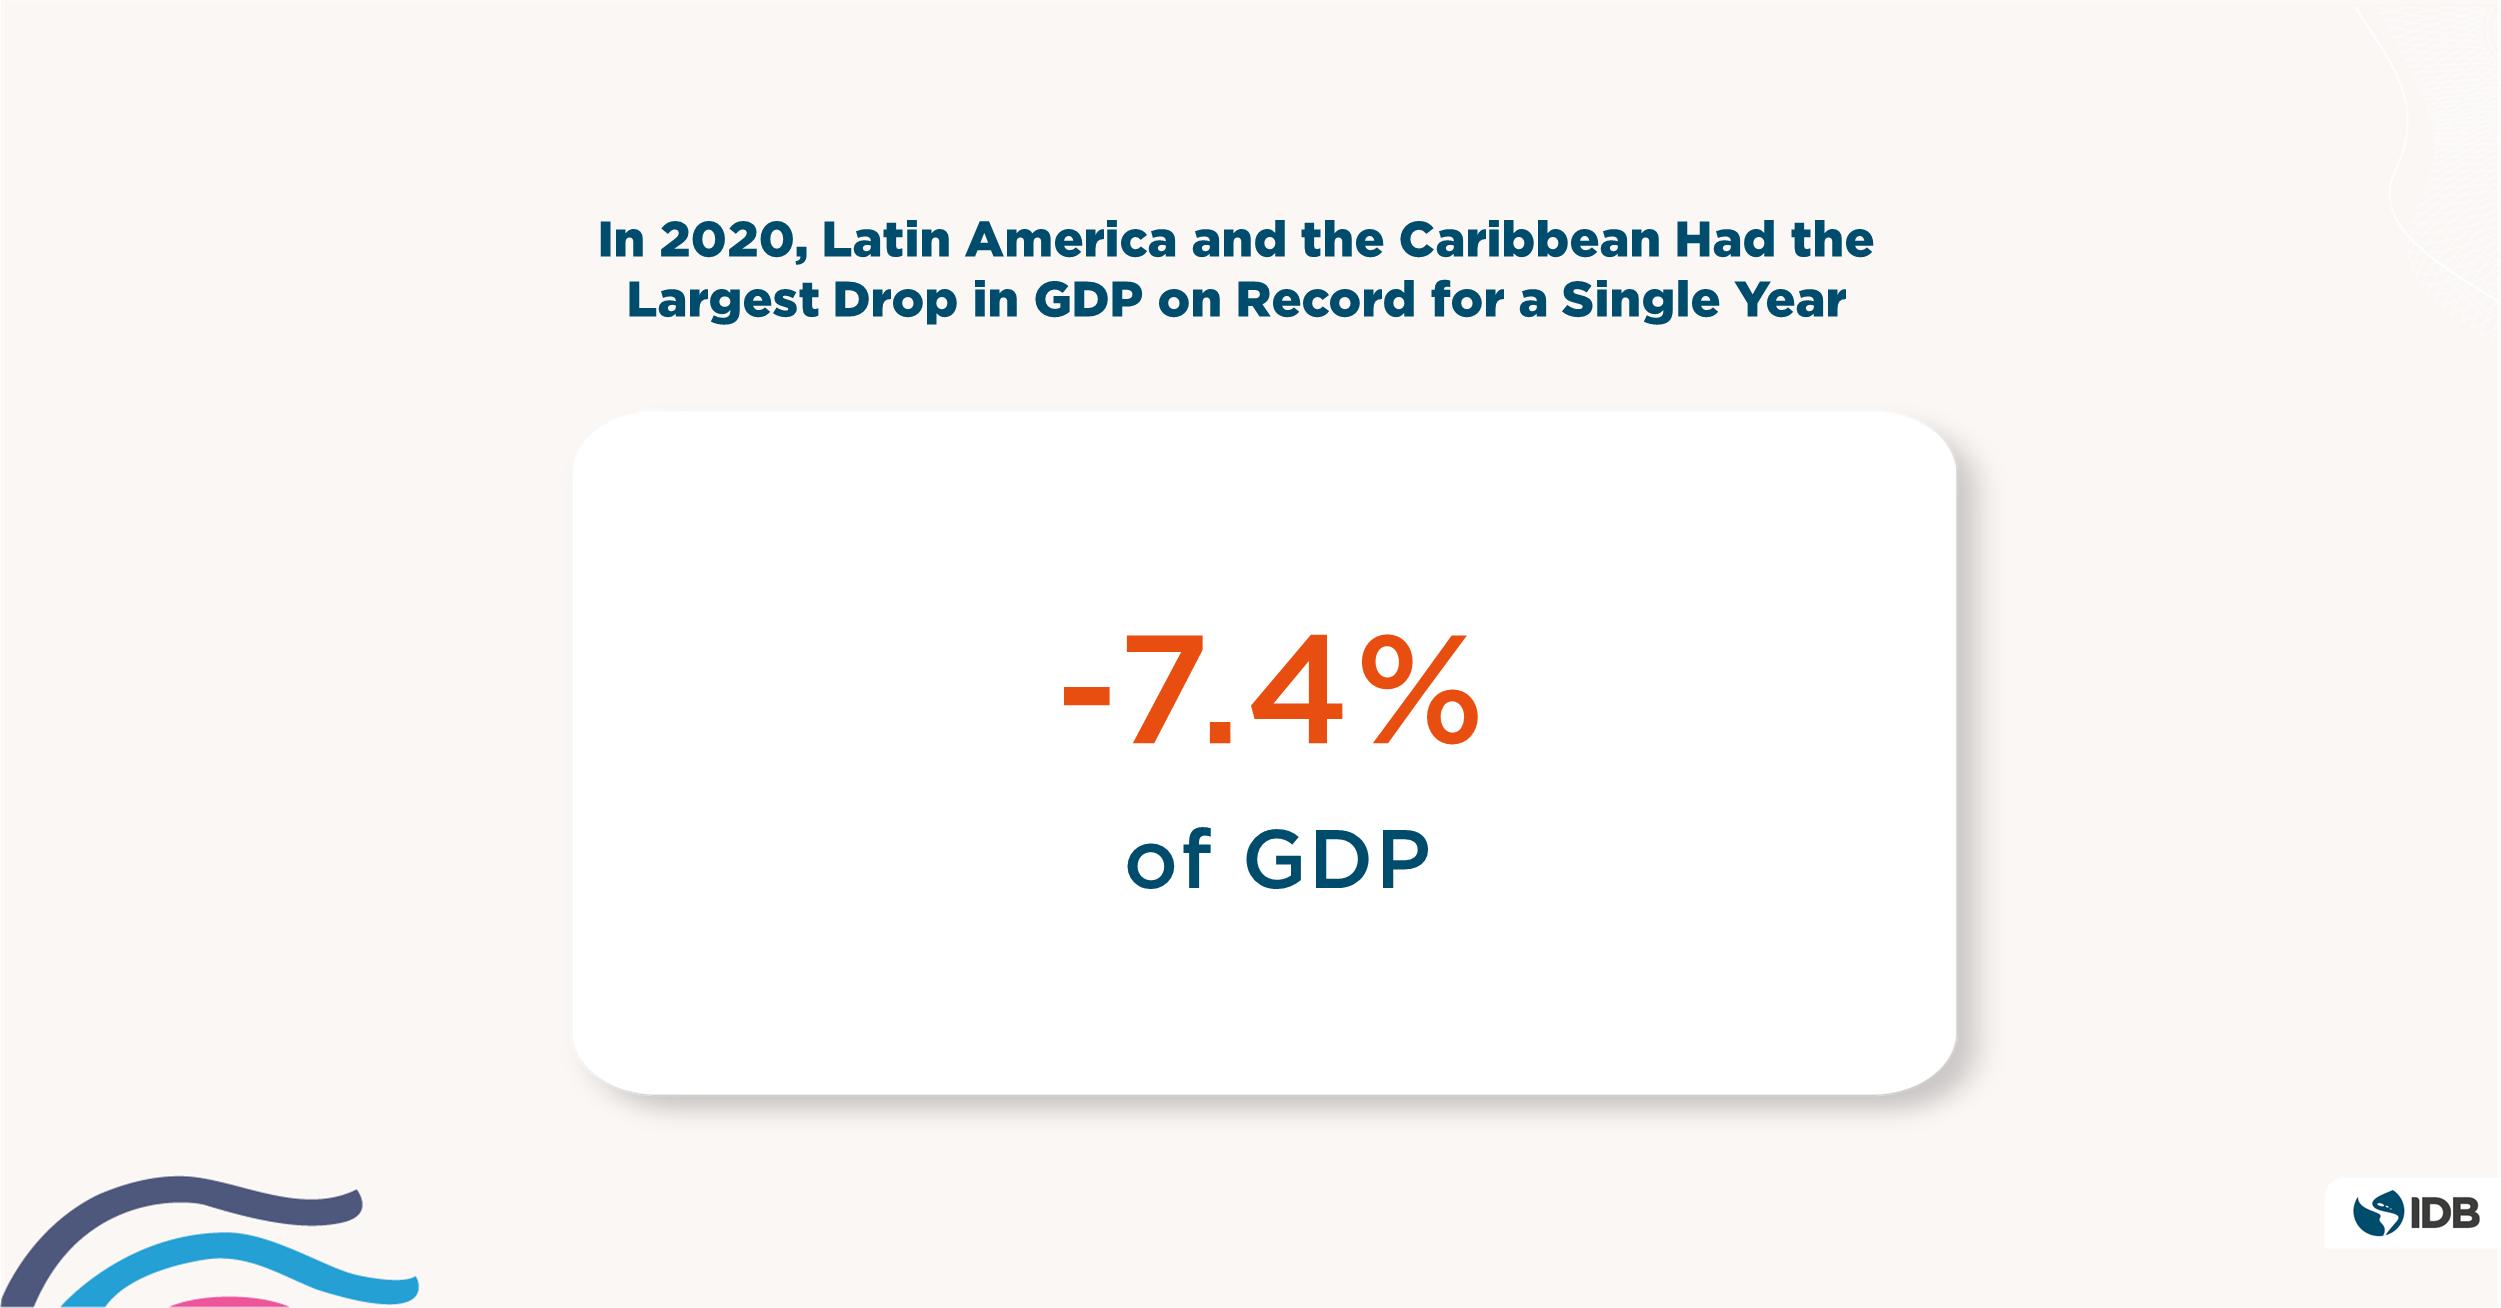 2021 Latin American and Caribbean Macroeconomic Report - Drop in GDP